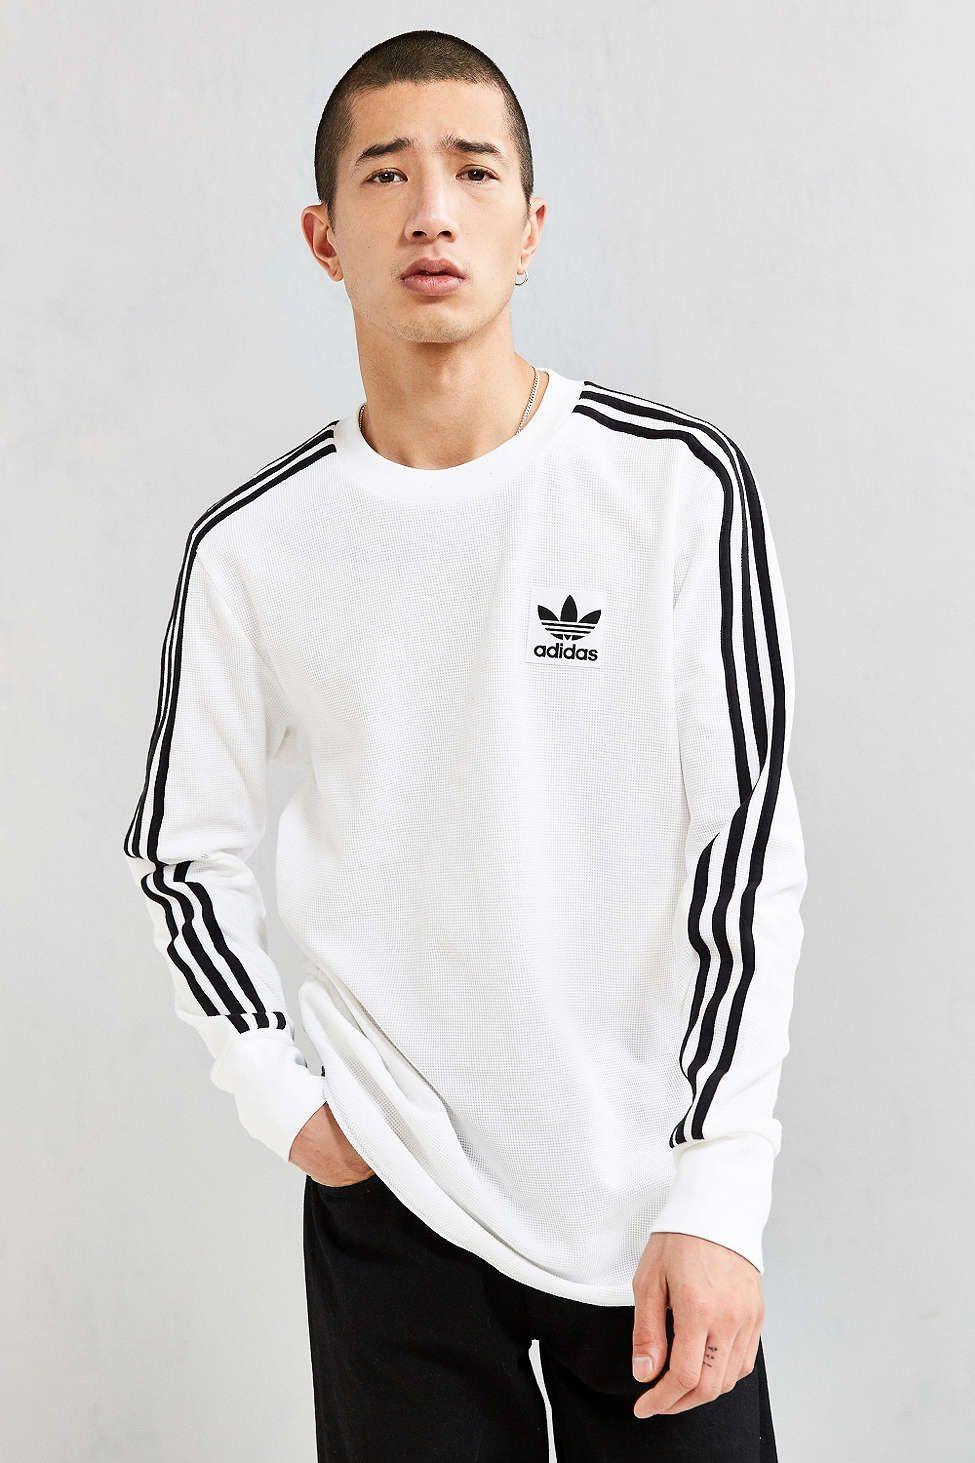 adidas Brand Waffle Long Sleeve Tee | Adidas brand